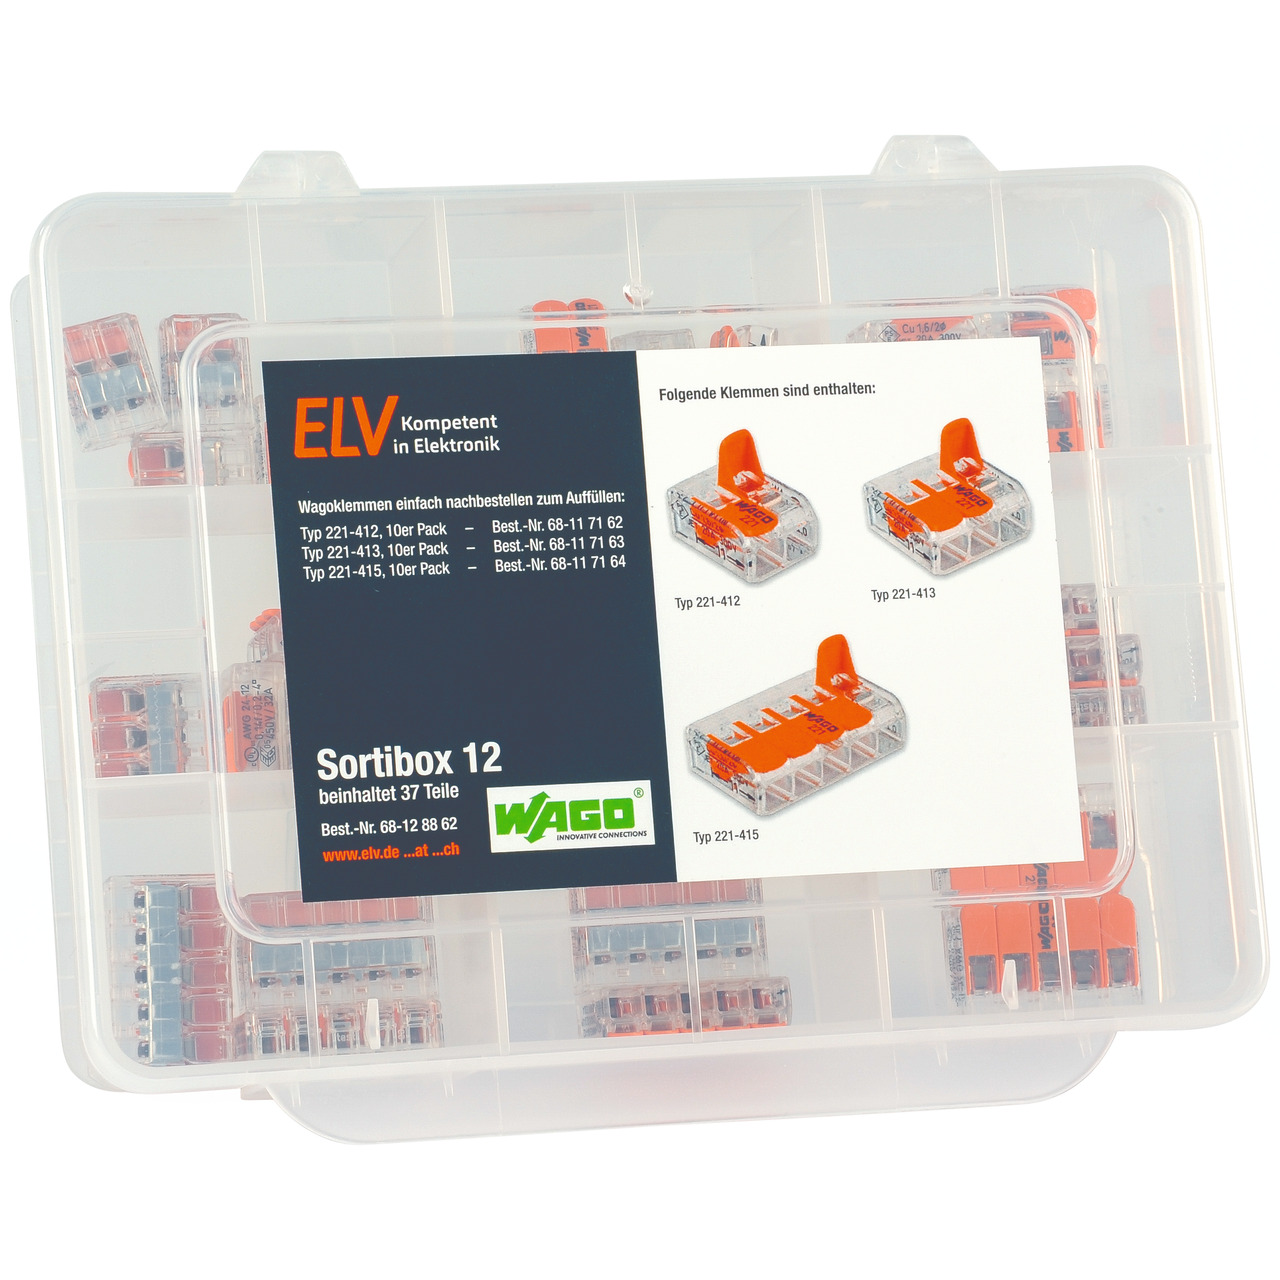 ELV Wago-Sortimentsbox Nr- 12 mit 37 Wago-Klemmen